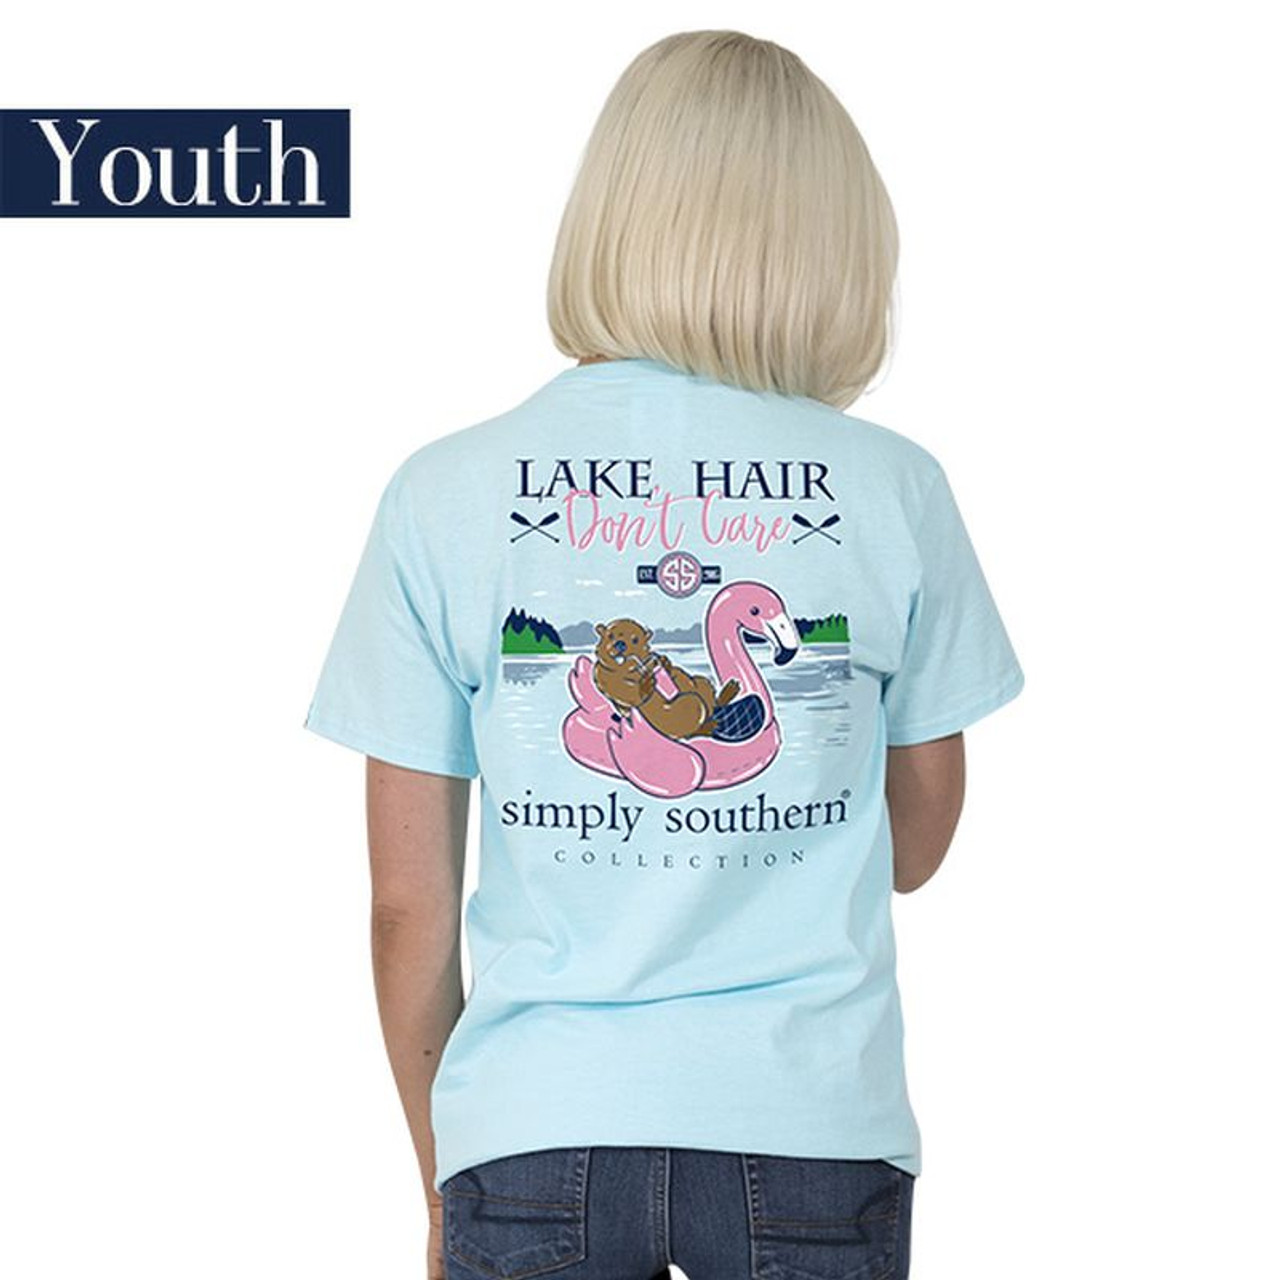 afd8c71571aa YOUTH Lake Hair Don t Care Flamingo 2018 Simply Southern Tee Shirt ...